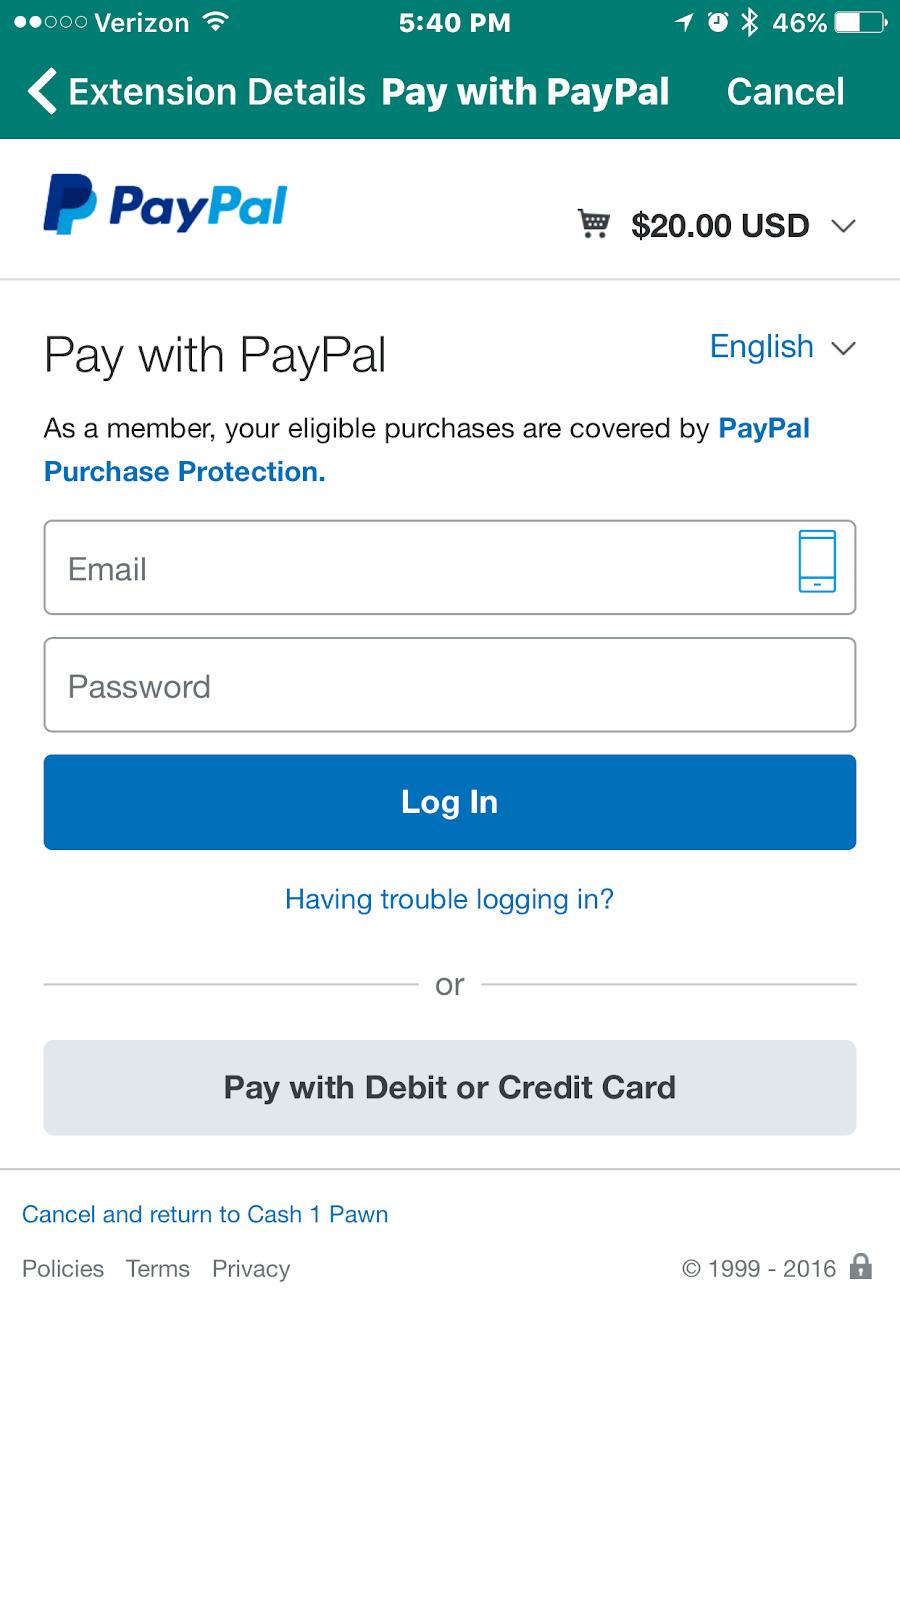 C:\Users\Cash1Pawn\Desktop\textpictures\7.png